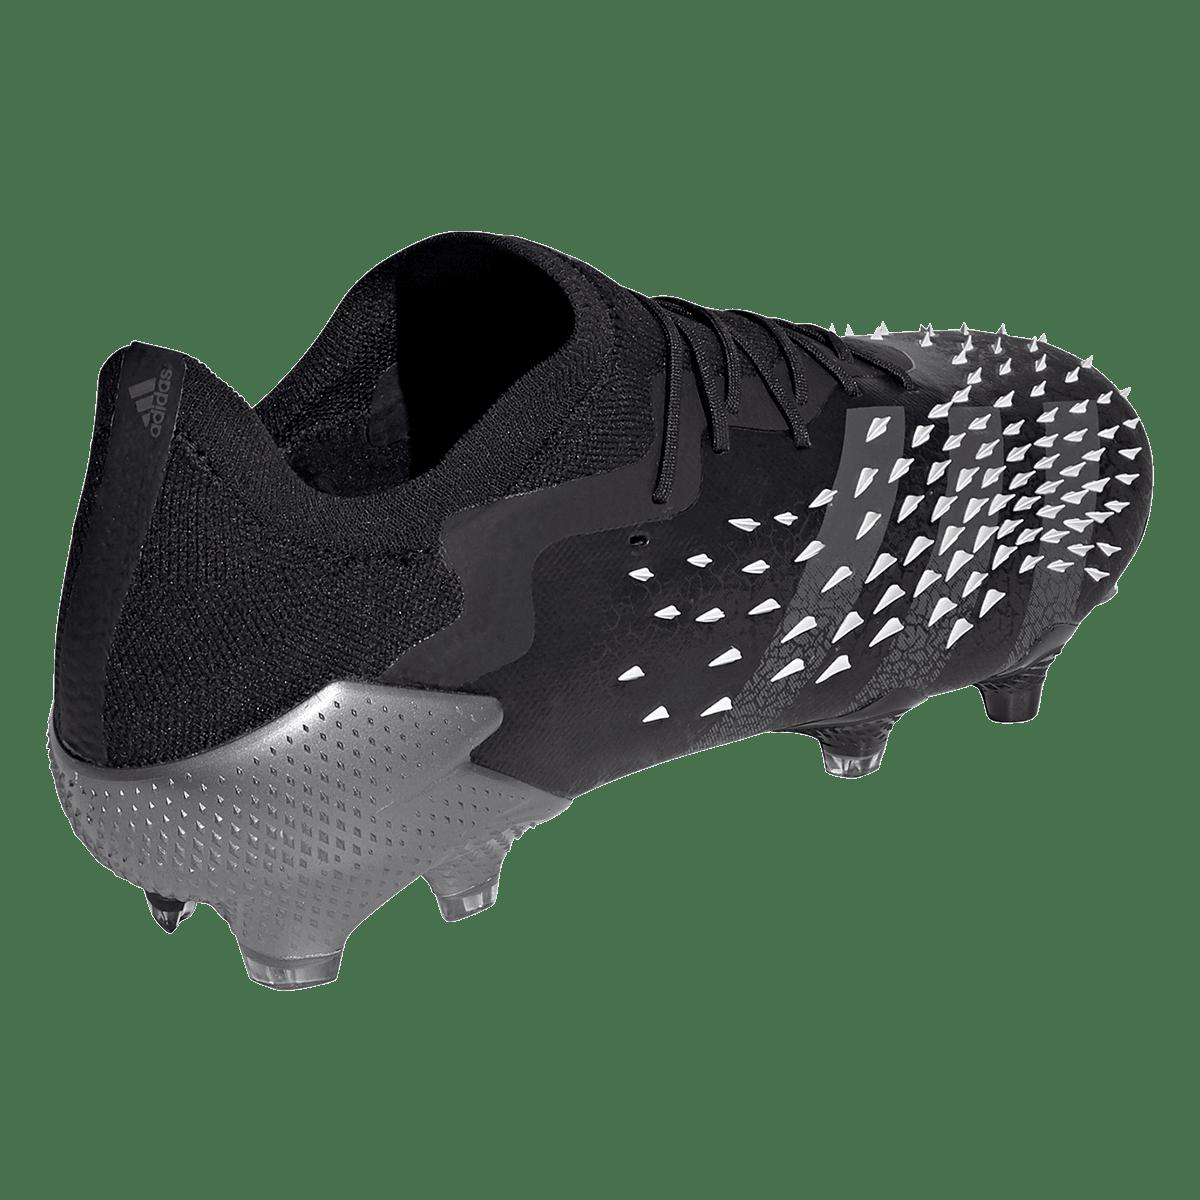 Chaussures de football adidas Predator Freak .1 L FG noir/gris ...